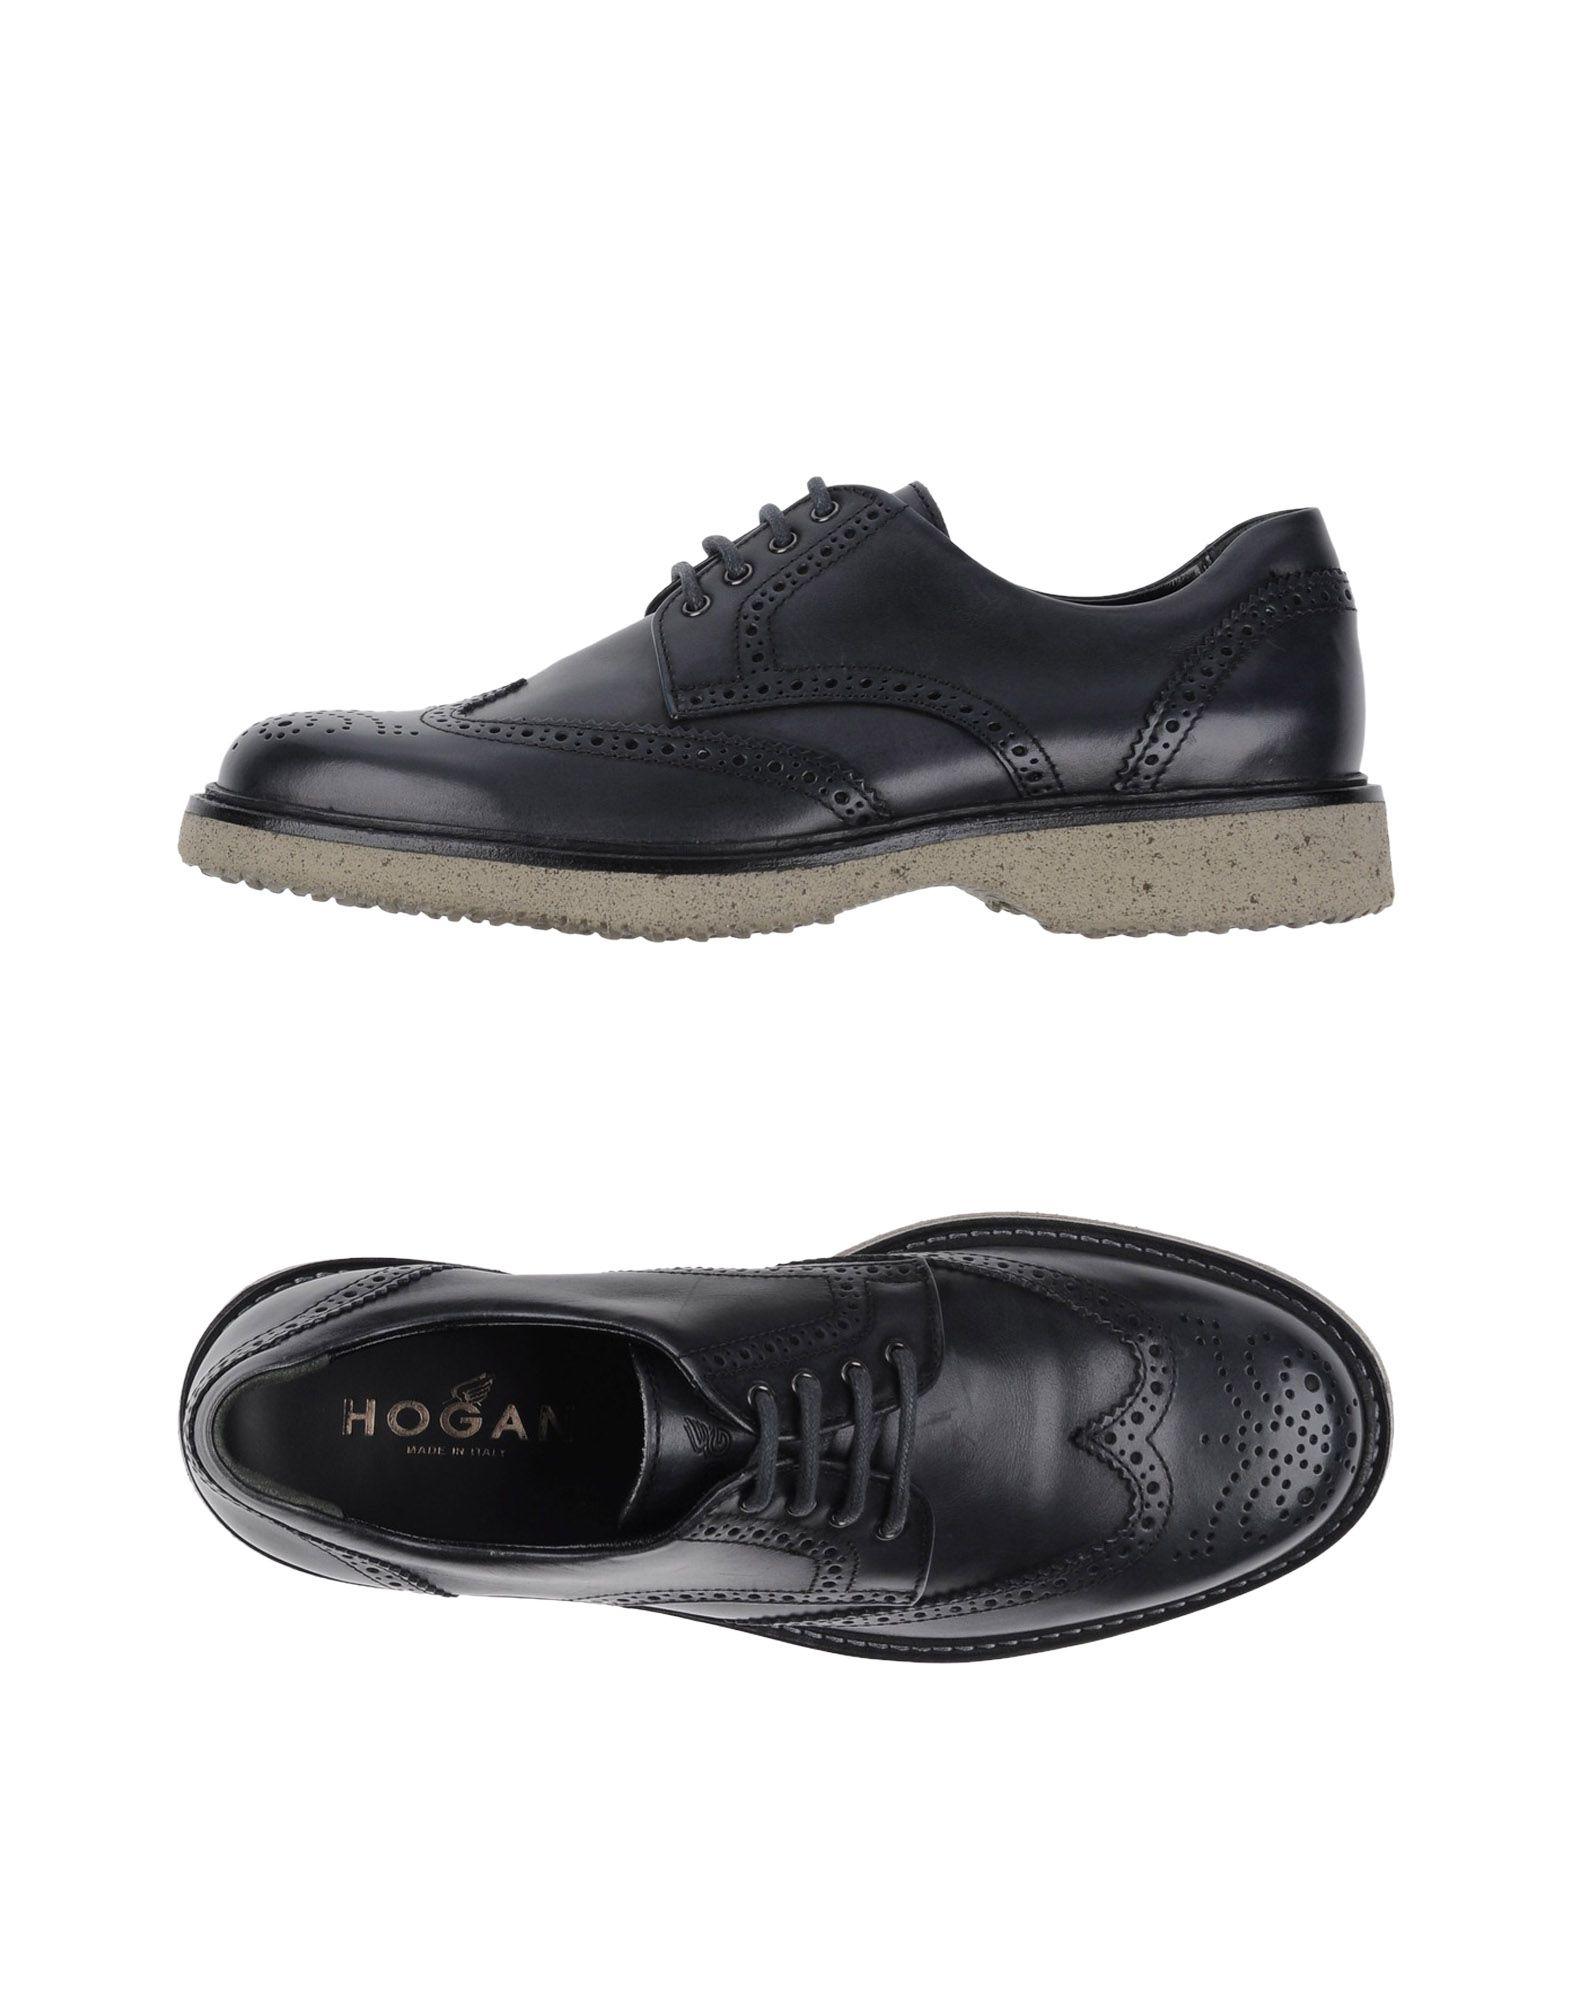 Stringate Hogan Uomo - 11176166QR elegante